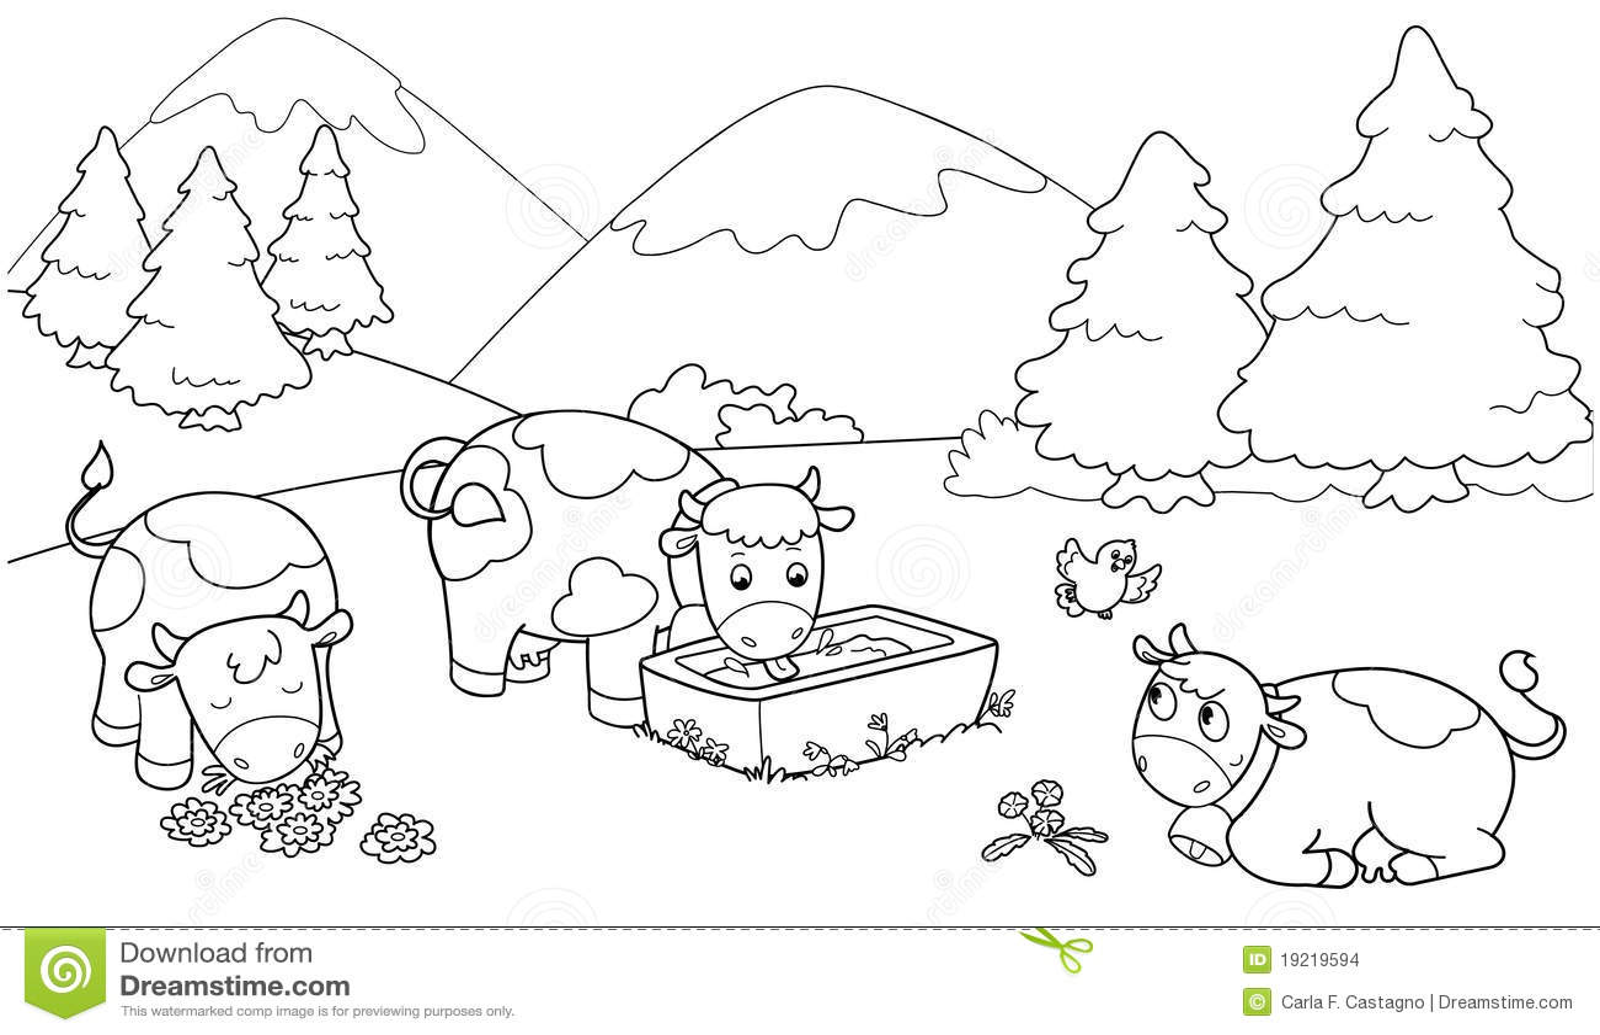 Mandalas Para Pintar Animal Bordeado De Paisaje On: Cute Cows Stock Images